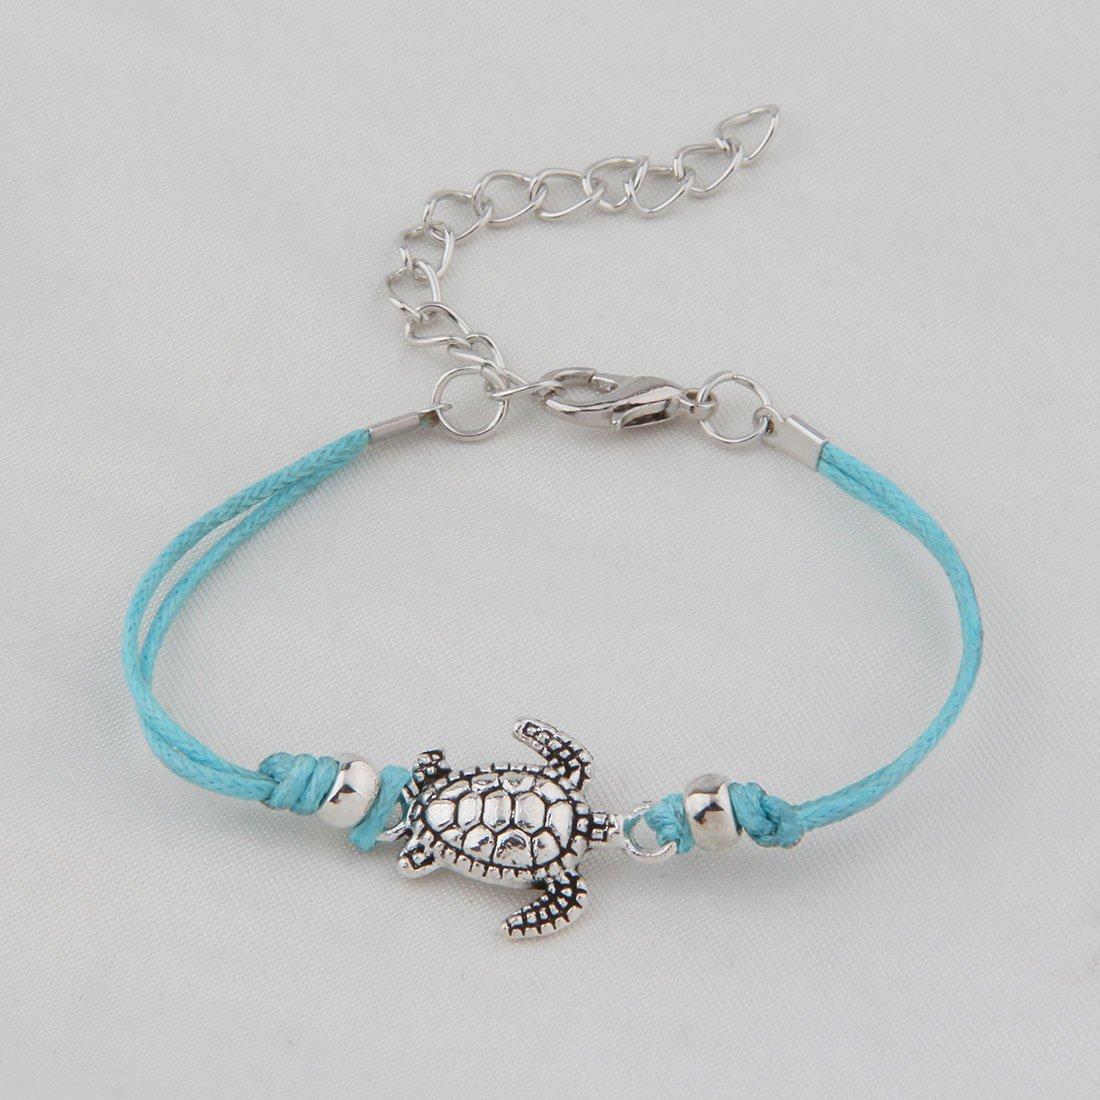 WUSUANED Vintage Wax Rope Turtle Anklet Bracelet Summer Beach Foot Jewelry